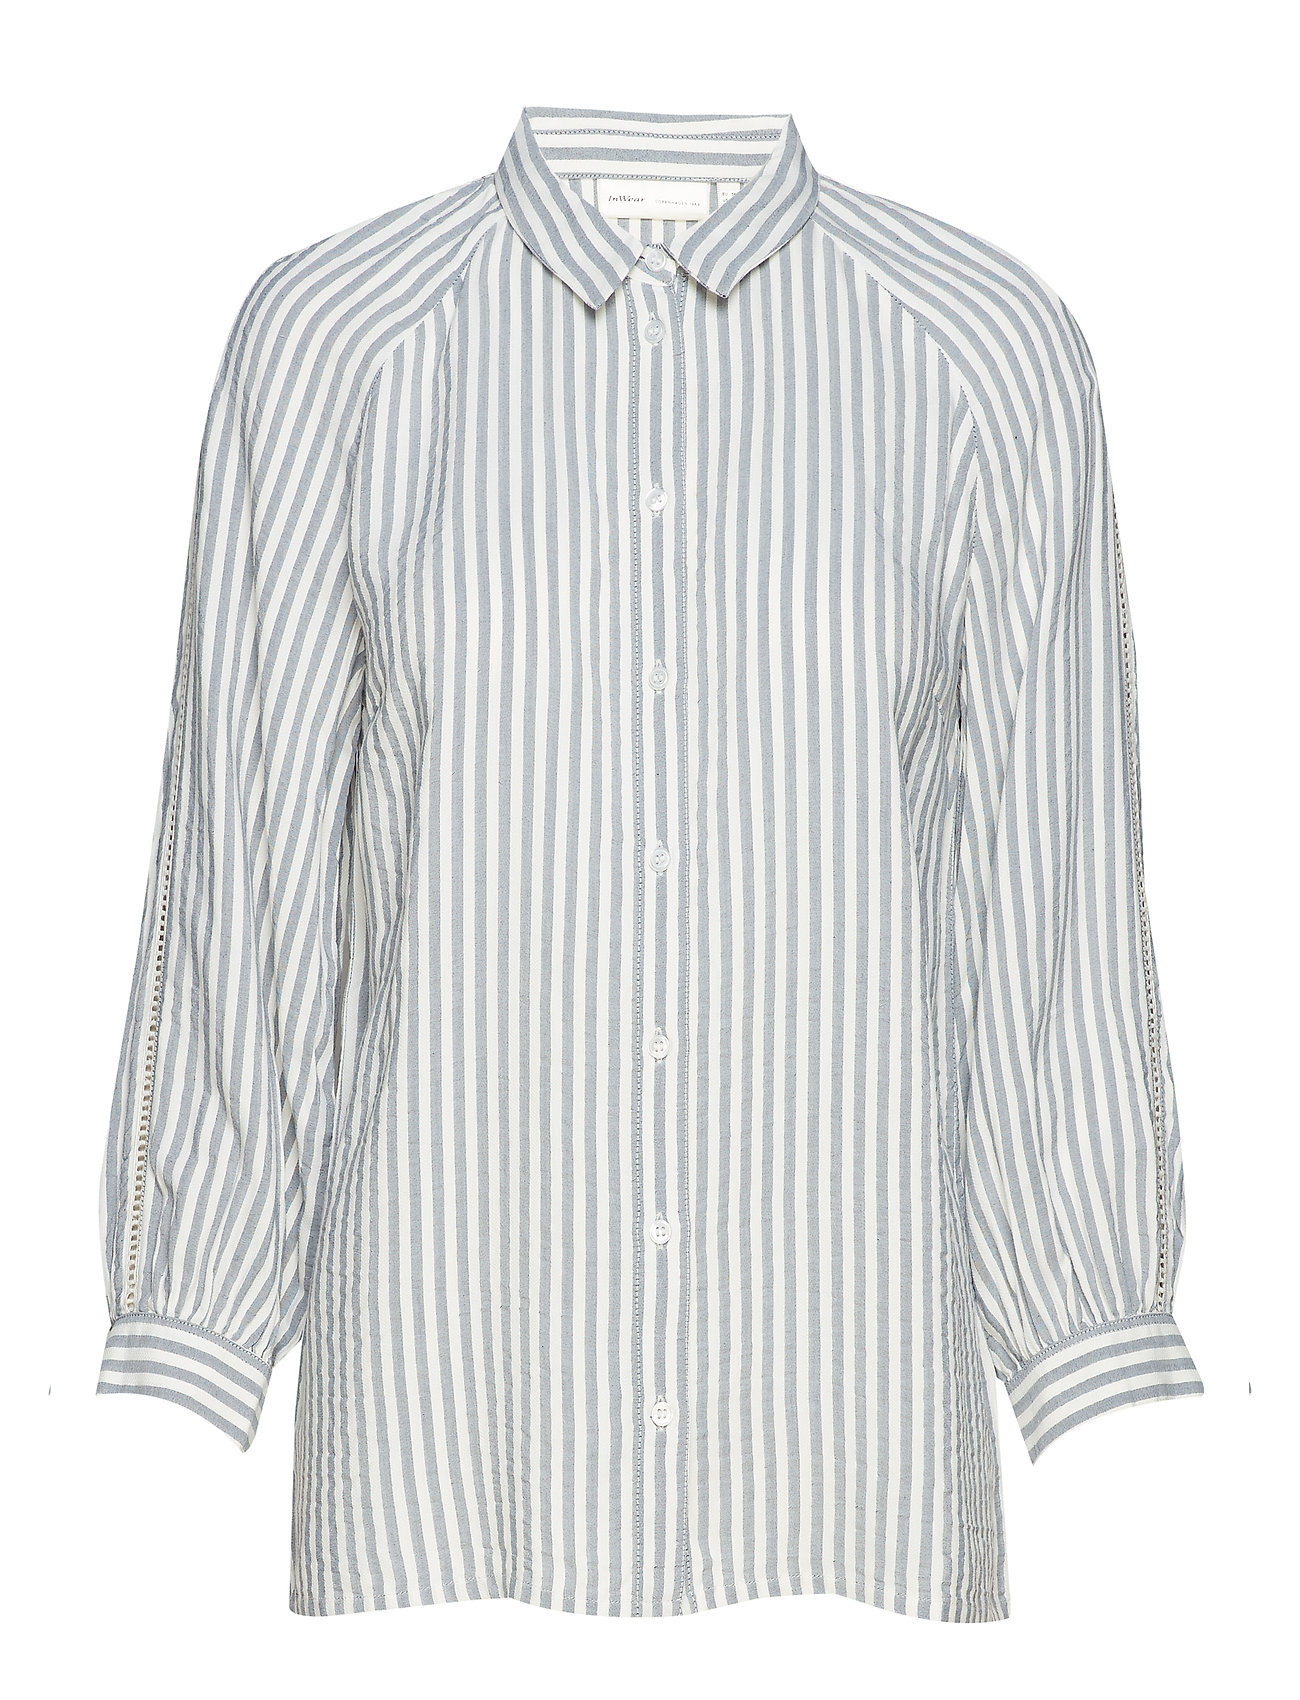 Image of Alma Striped Shirt (3090826385)